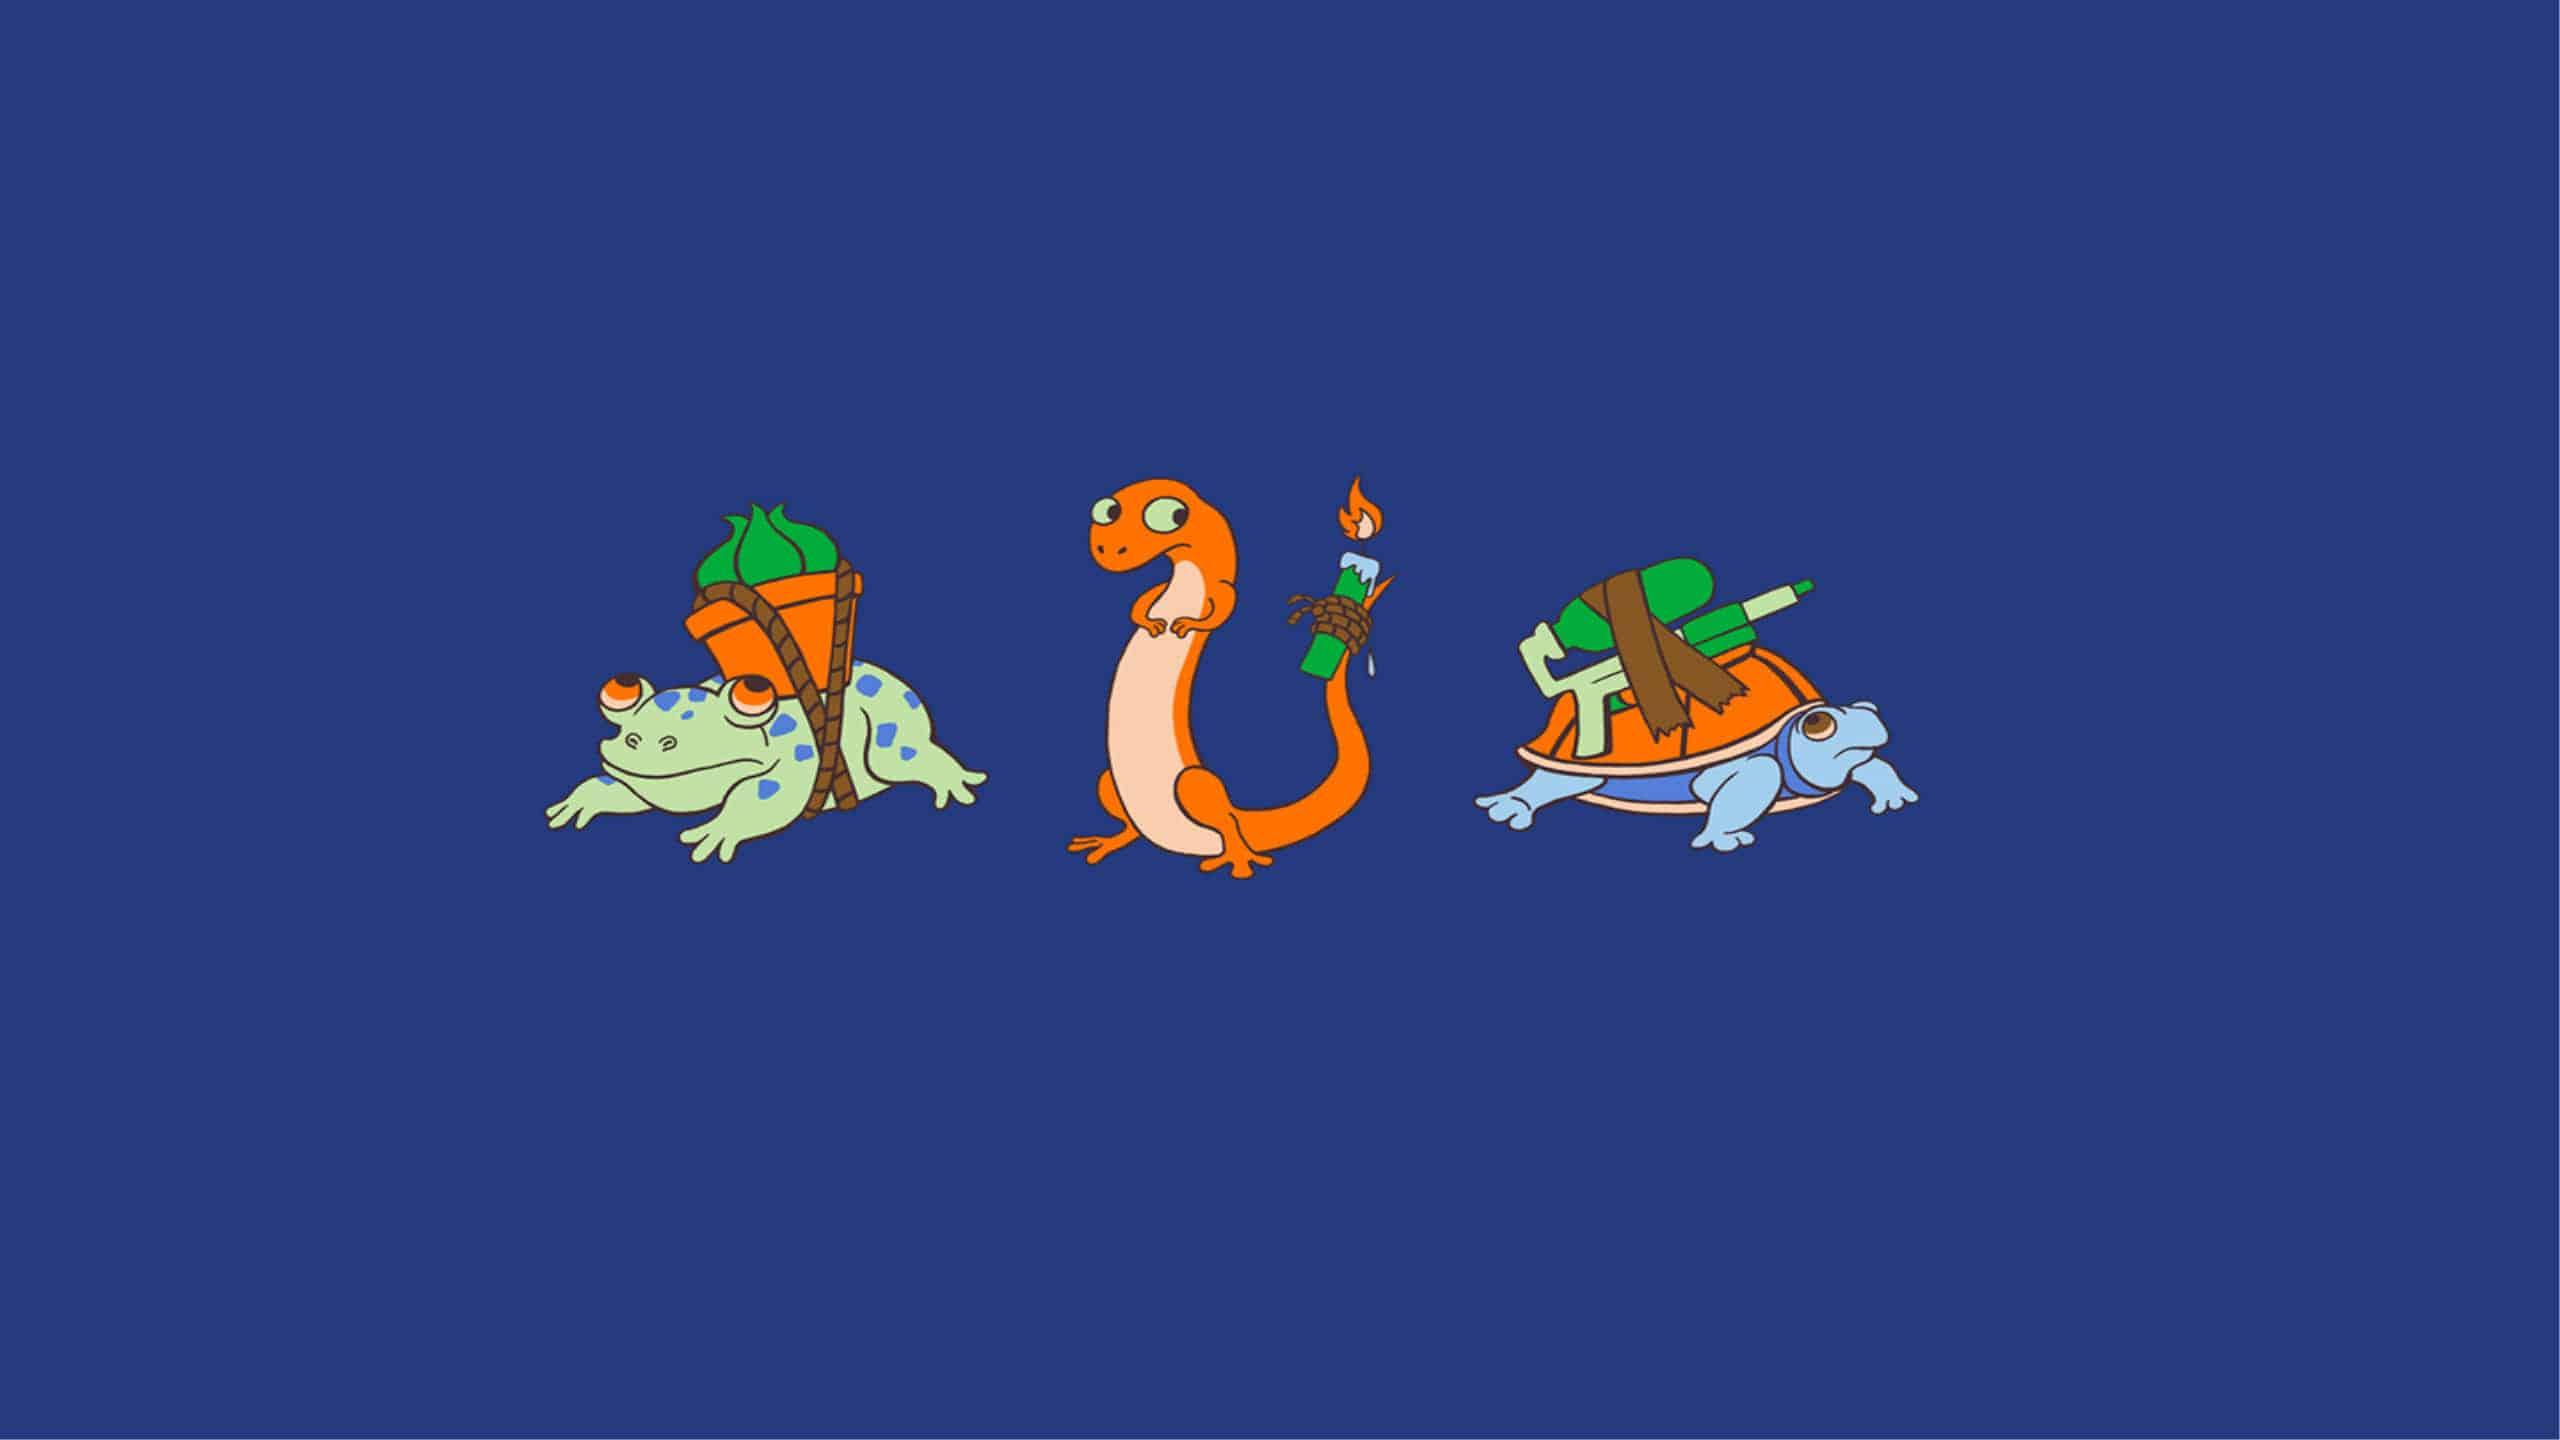 pokemon the original three artwork wqhd 1440p wallpaper